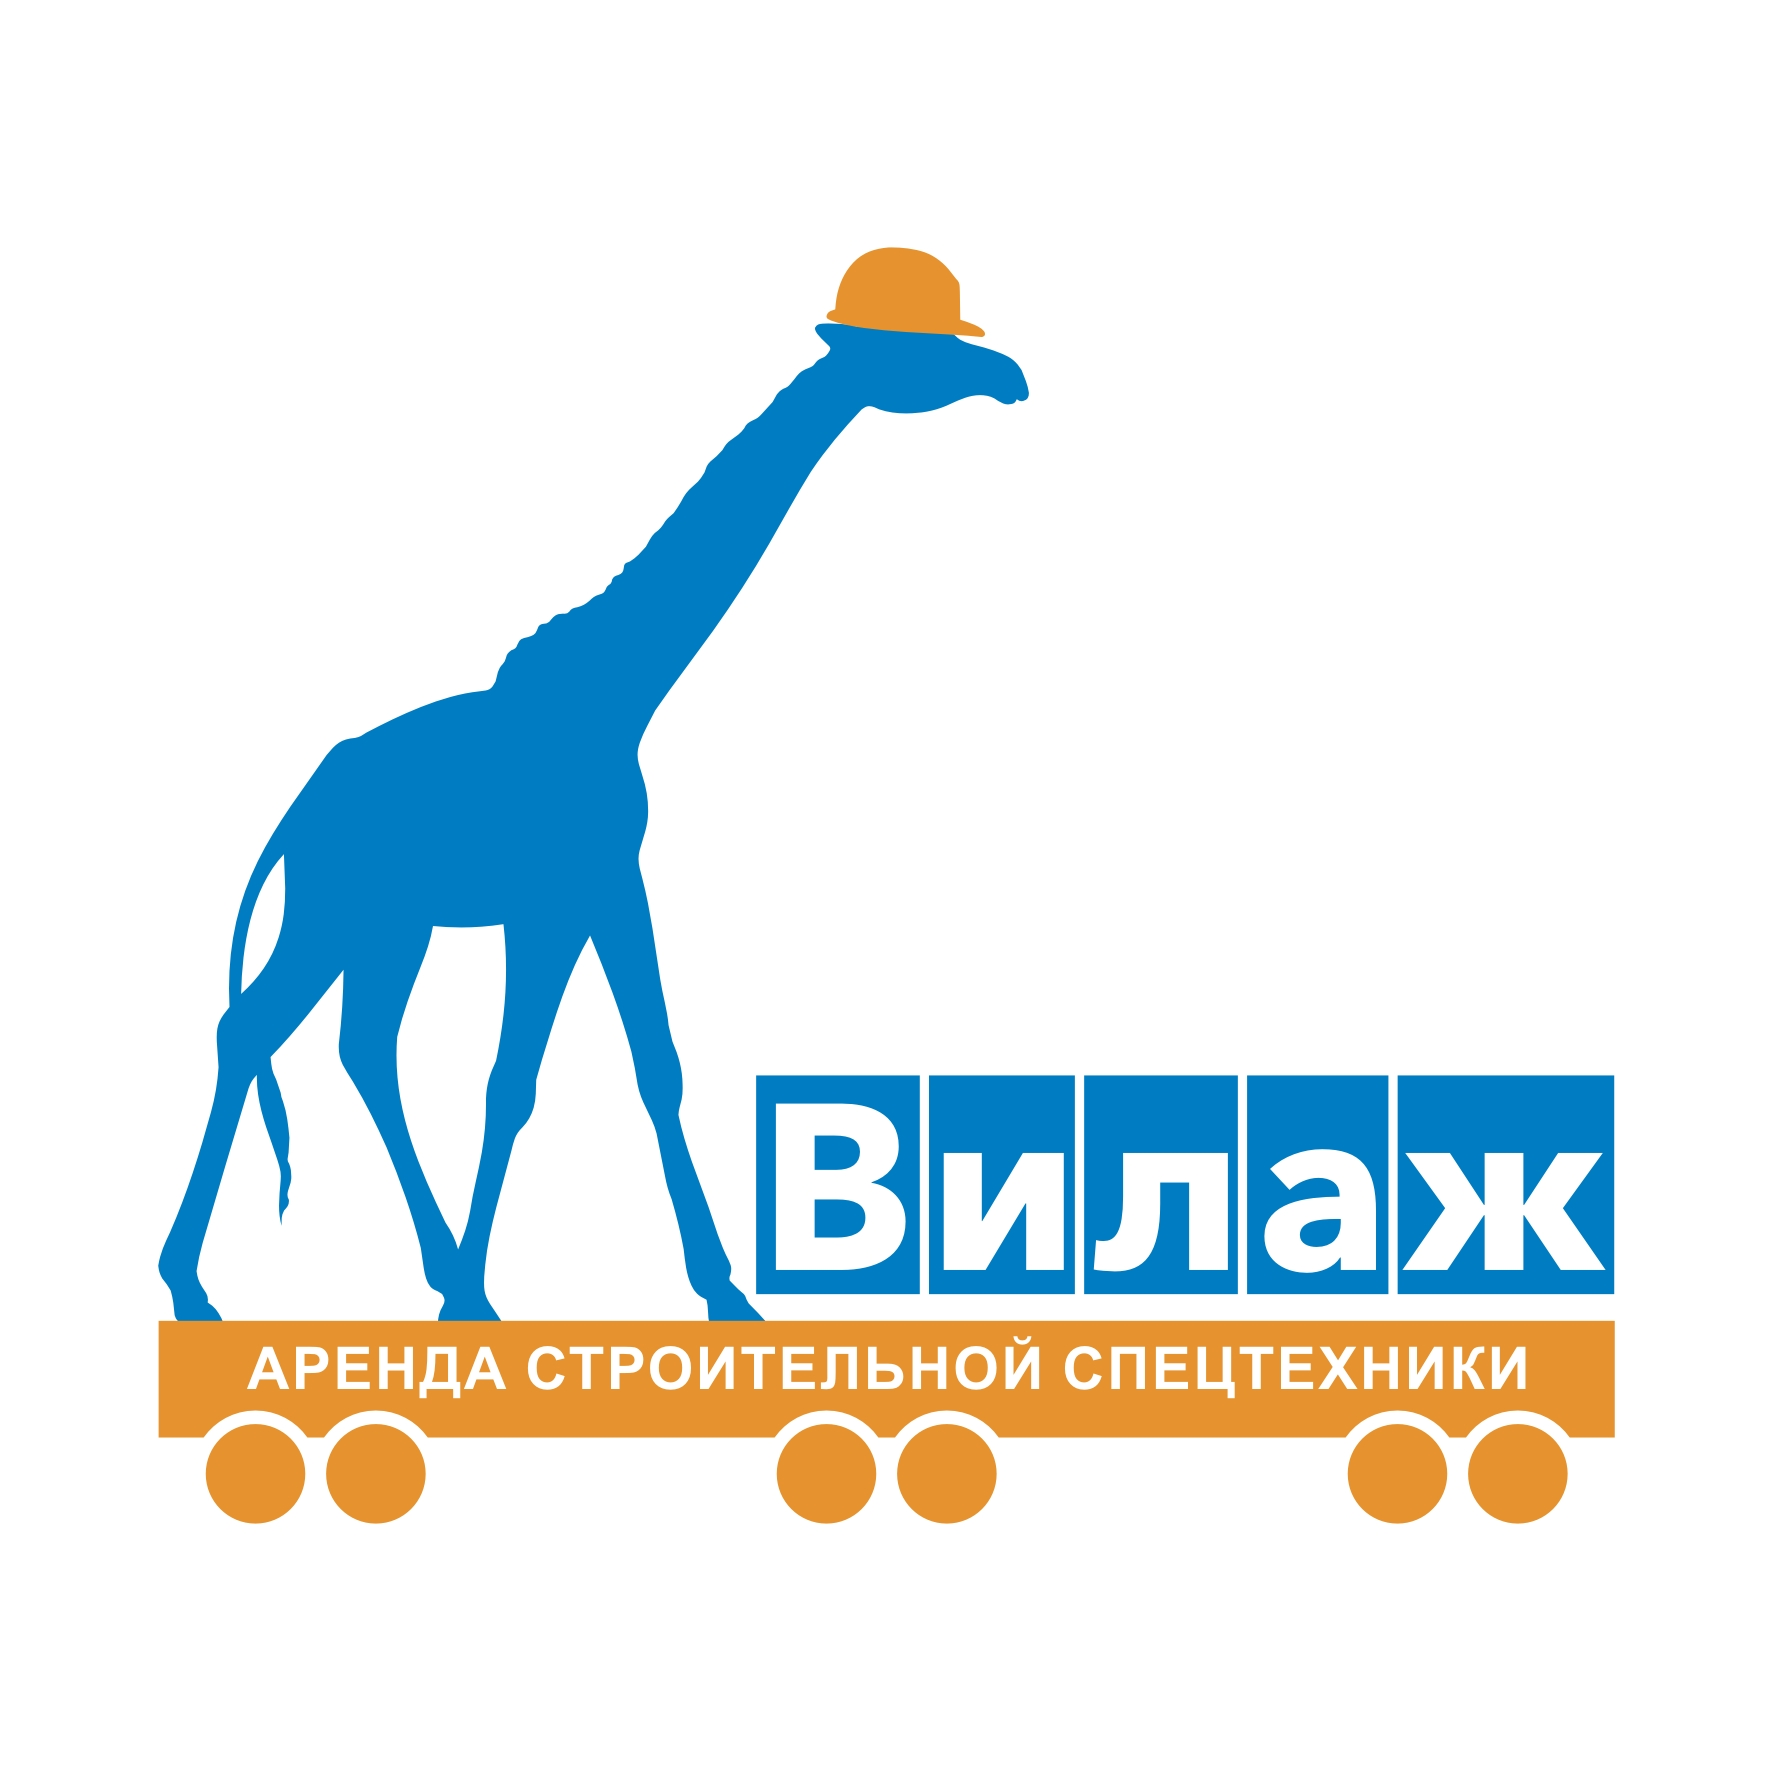 Логотип для компании по аренде спец.техники фото f_53359905d693966f.jpg